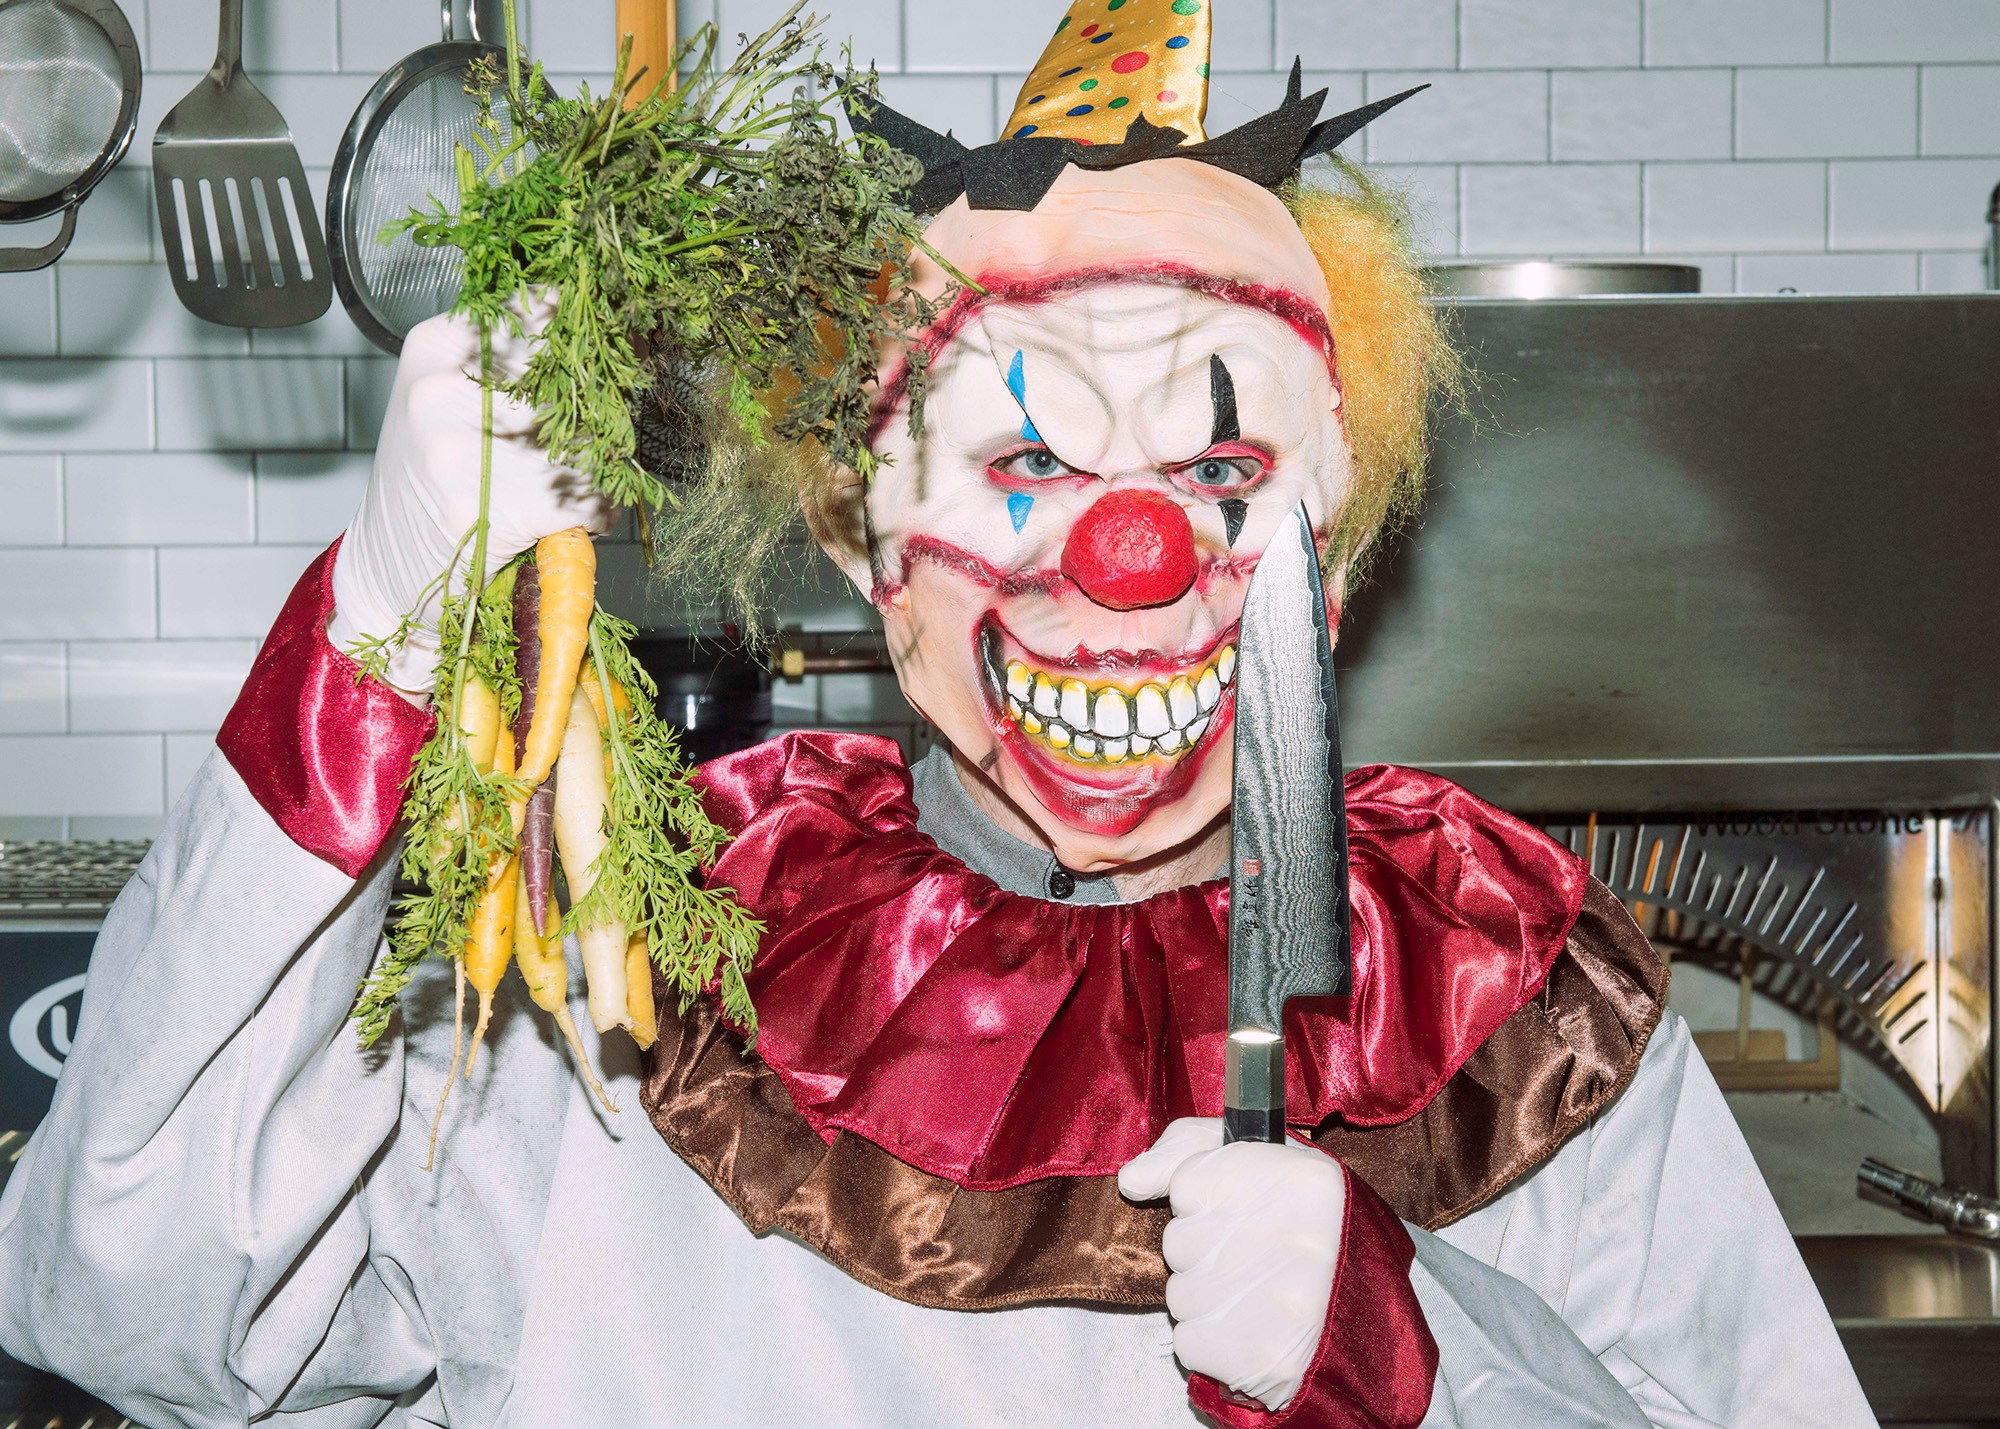 clown-knives-shoot-11